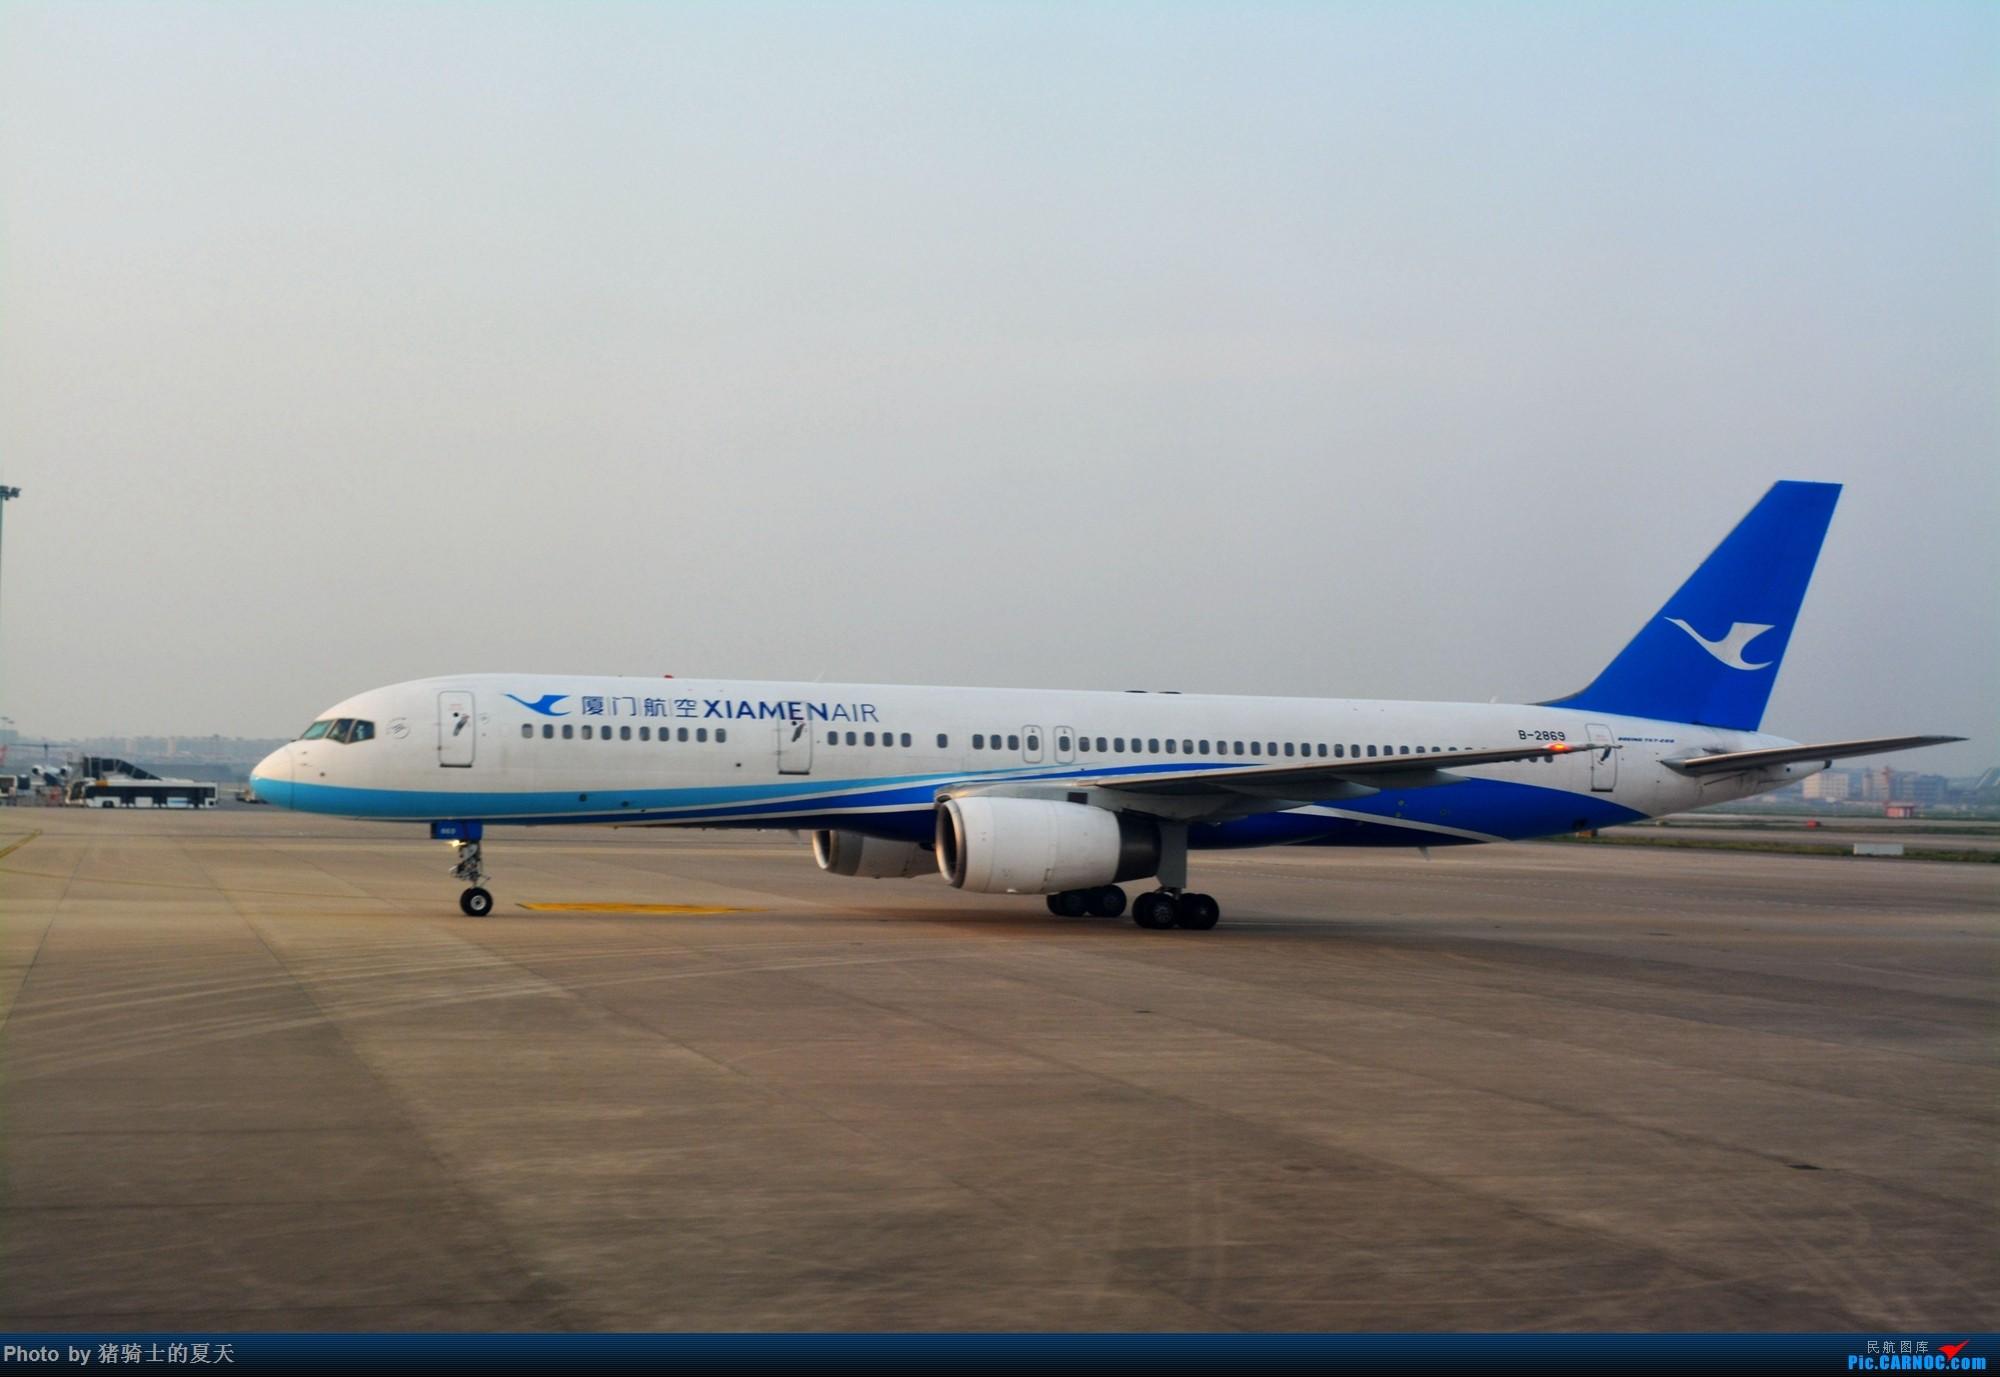 Re:[原创]2017年鸡鸭图 BOEING 757-200 B-2869 中国上海虹桥国际机场